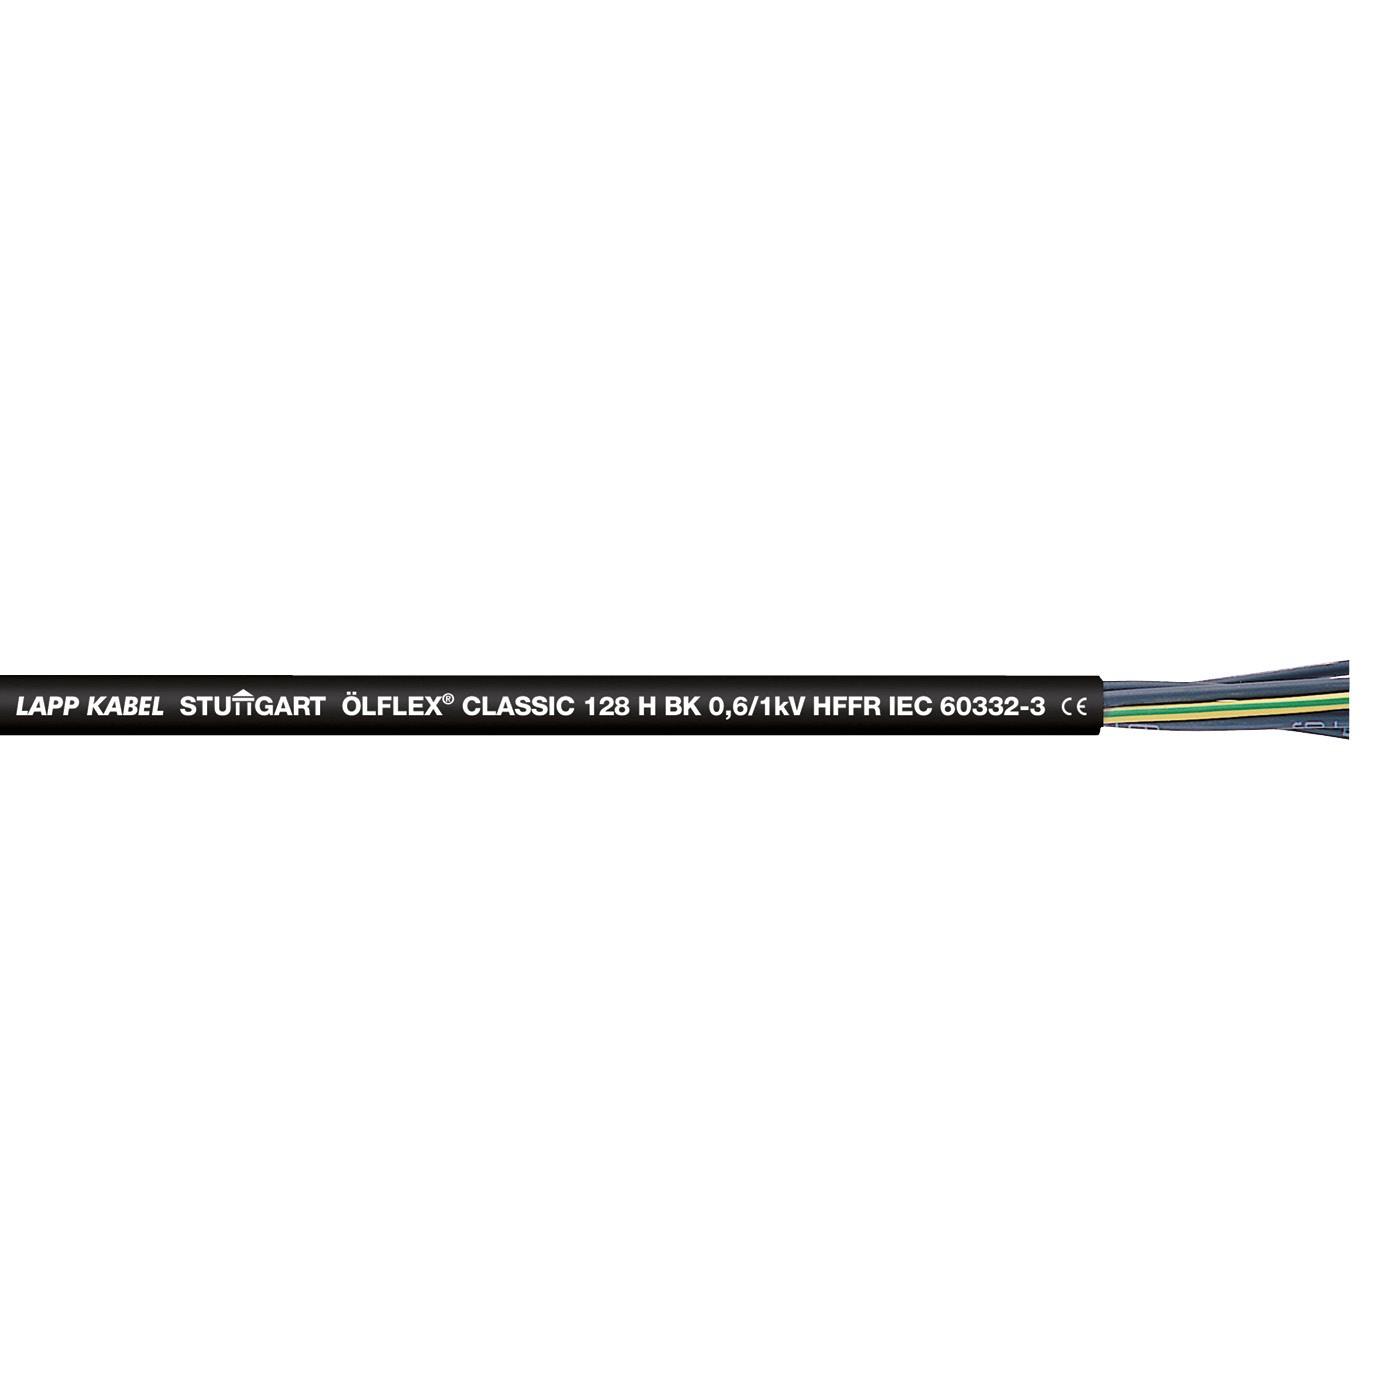 ÖLFLEX® CLASSIC 128 H BK 0,6/1kV